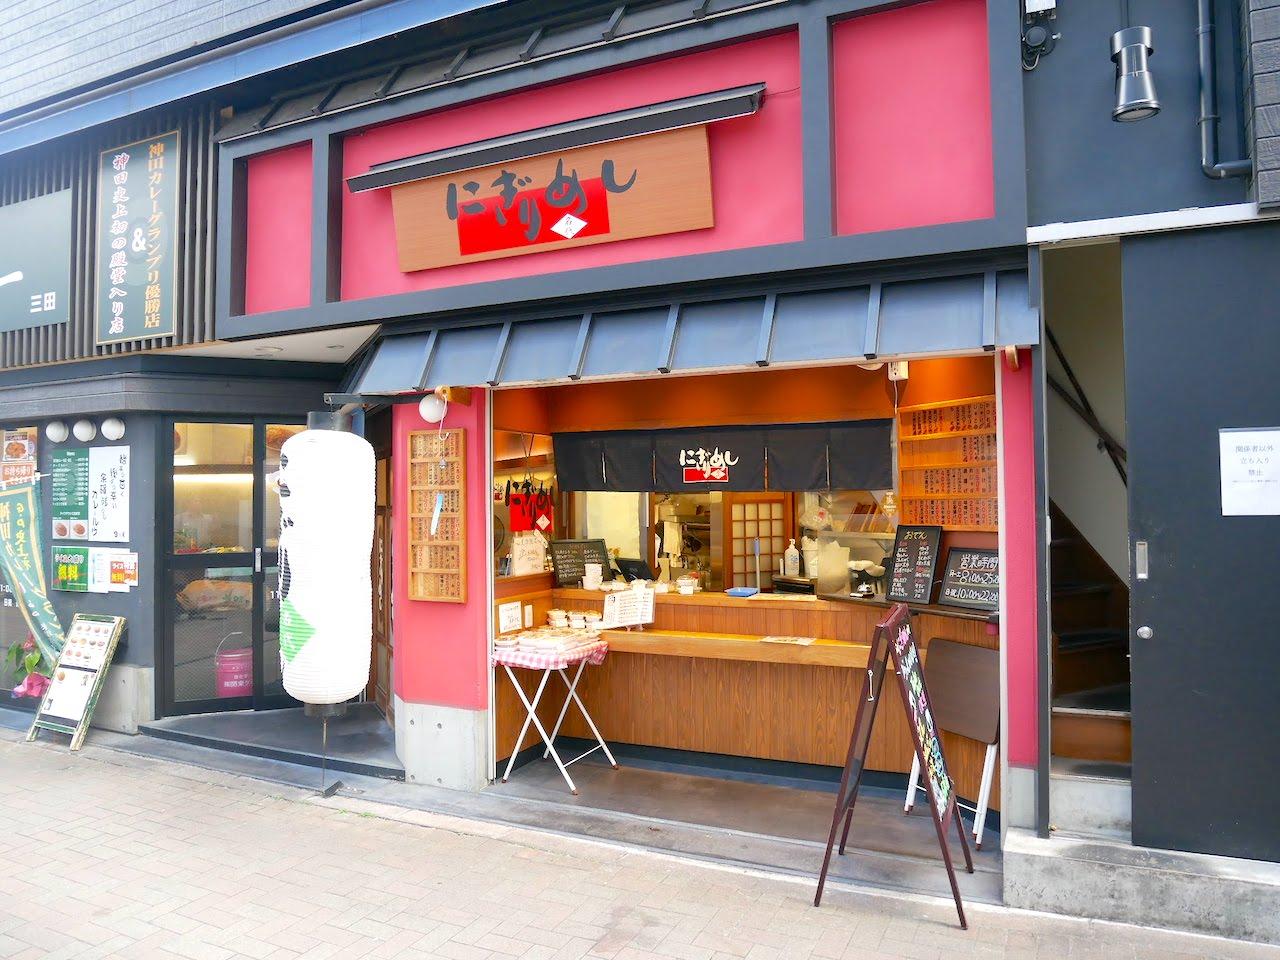 http://morning.tokyo-review.com/images/1150929.jpg